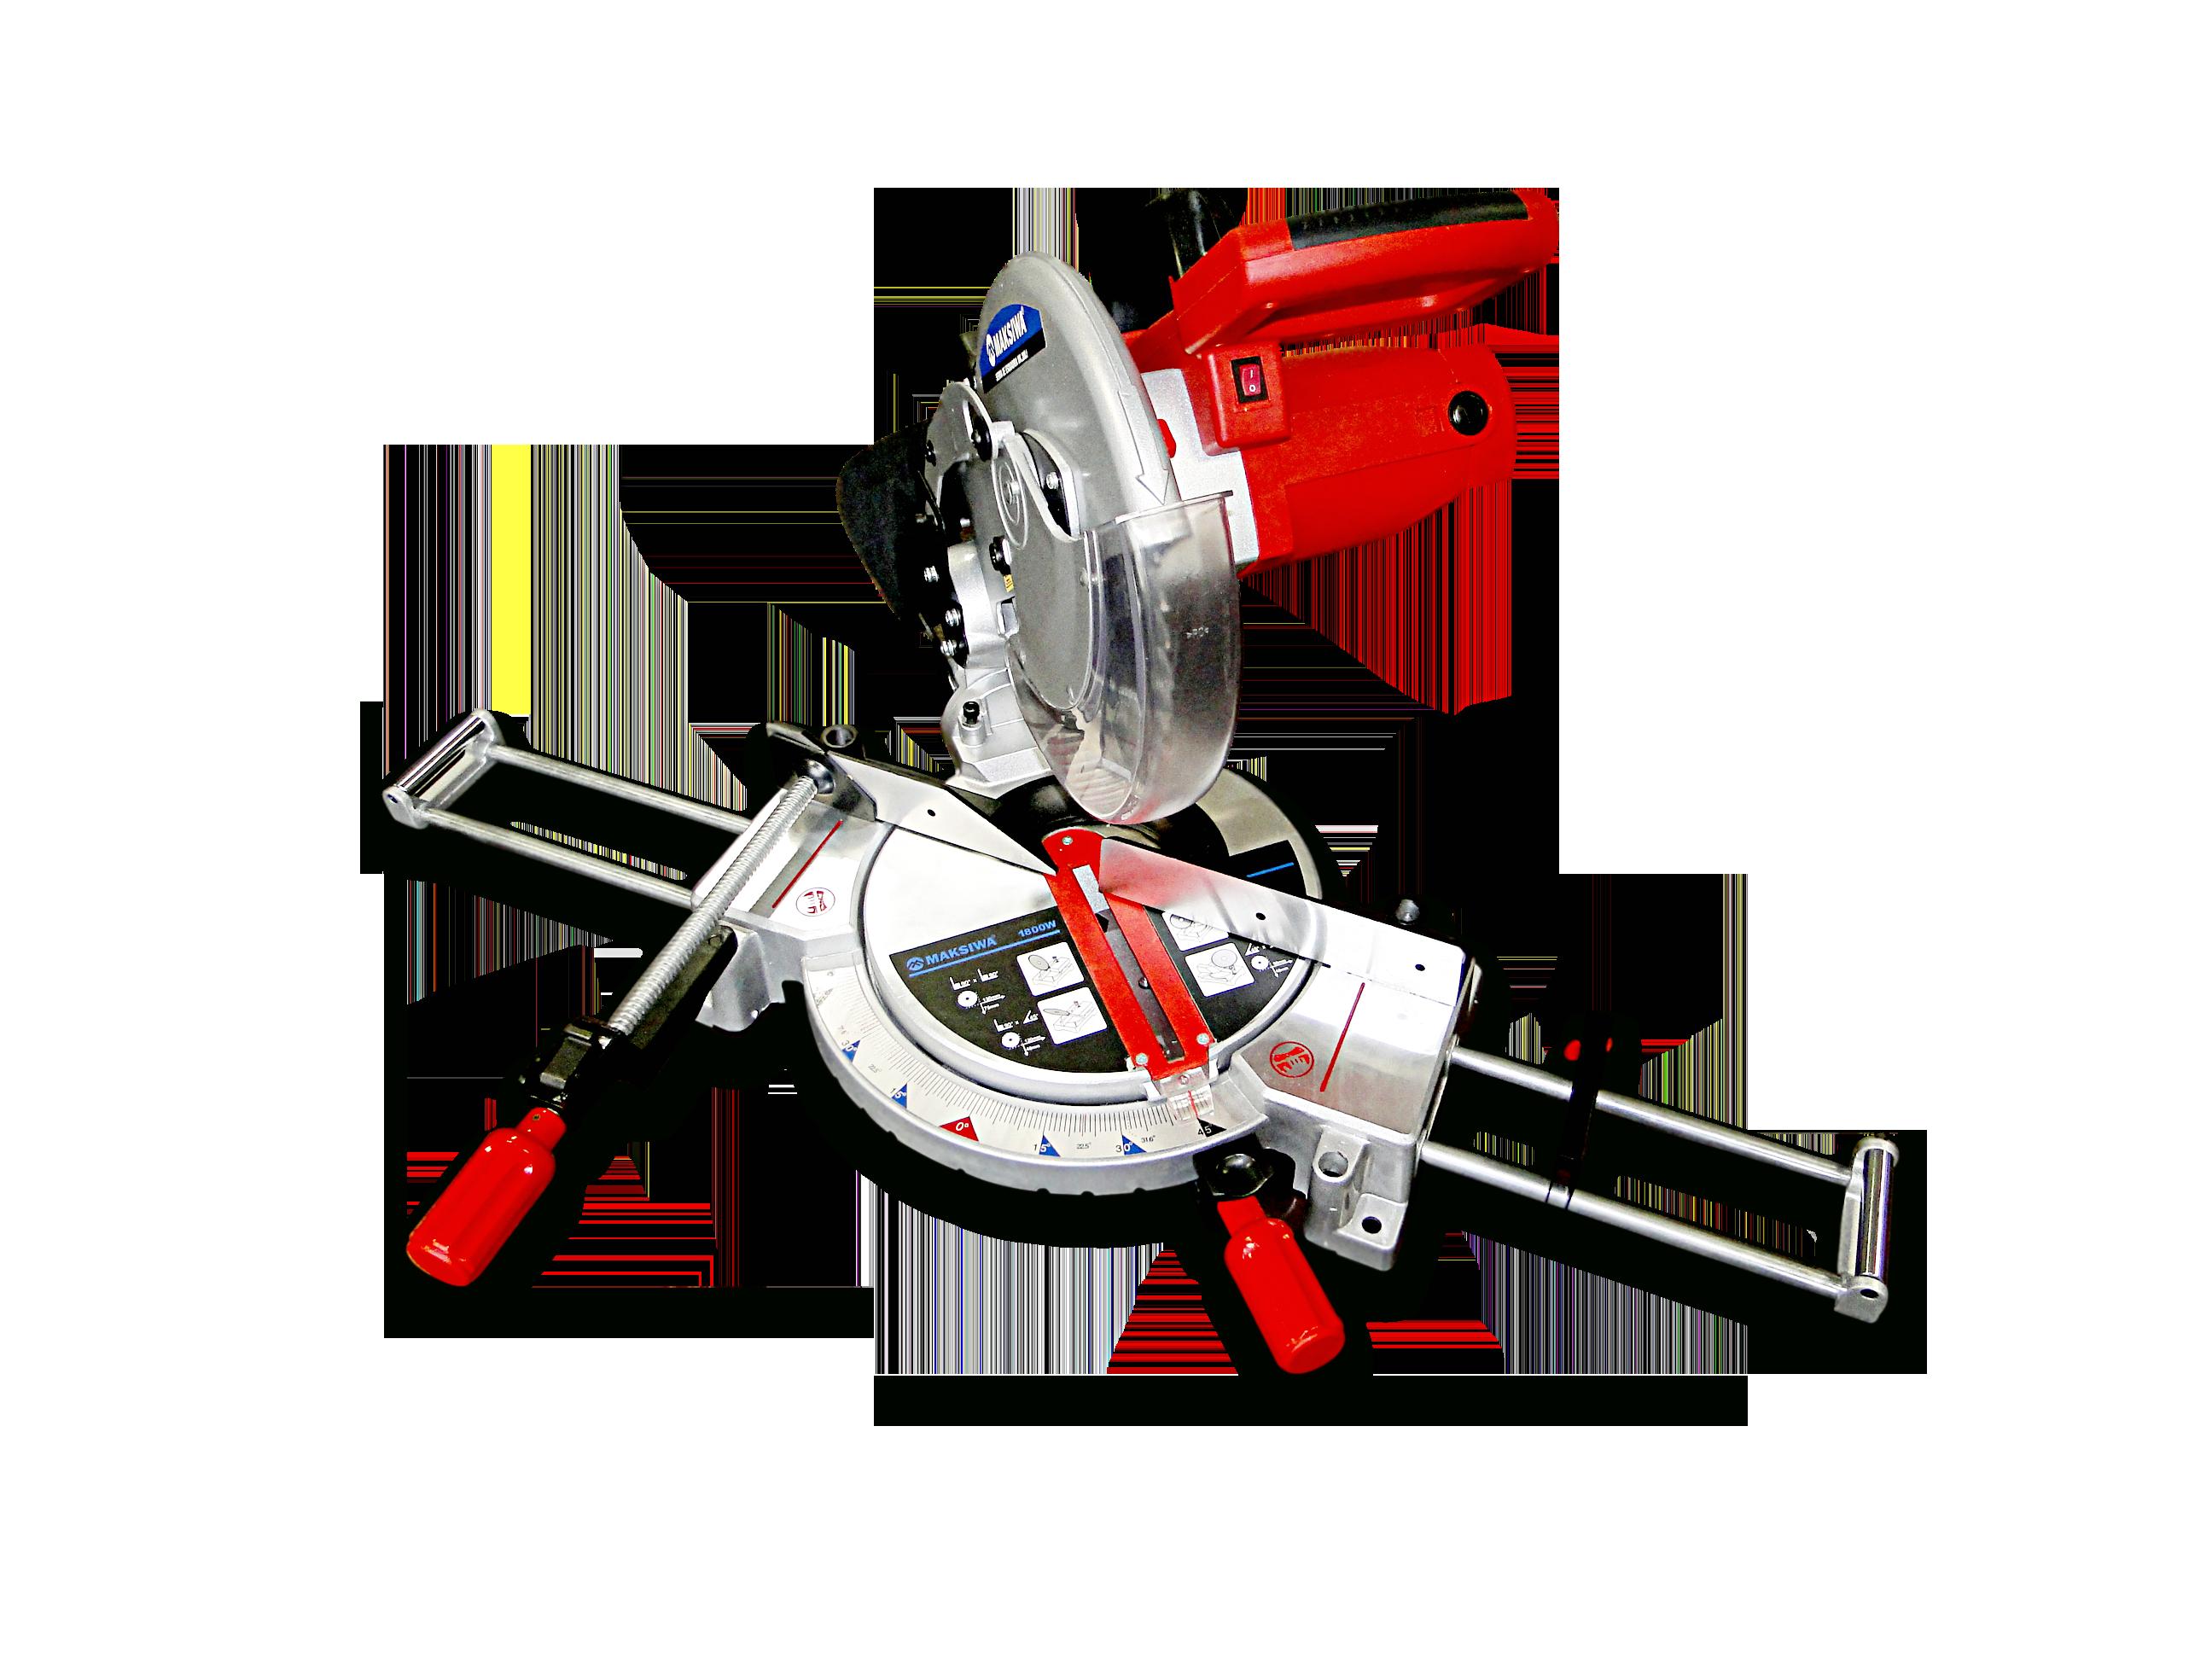 miter-saw-mk200i (4)